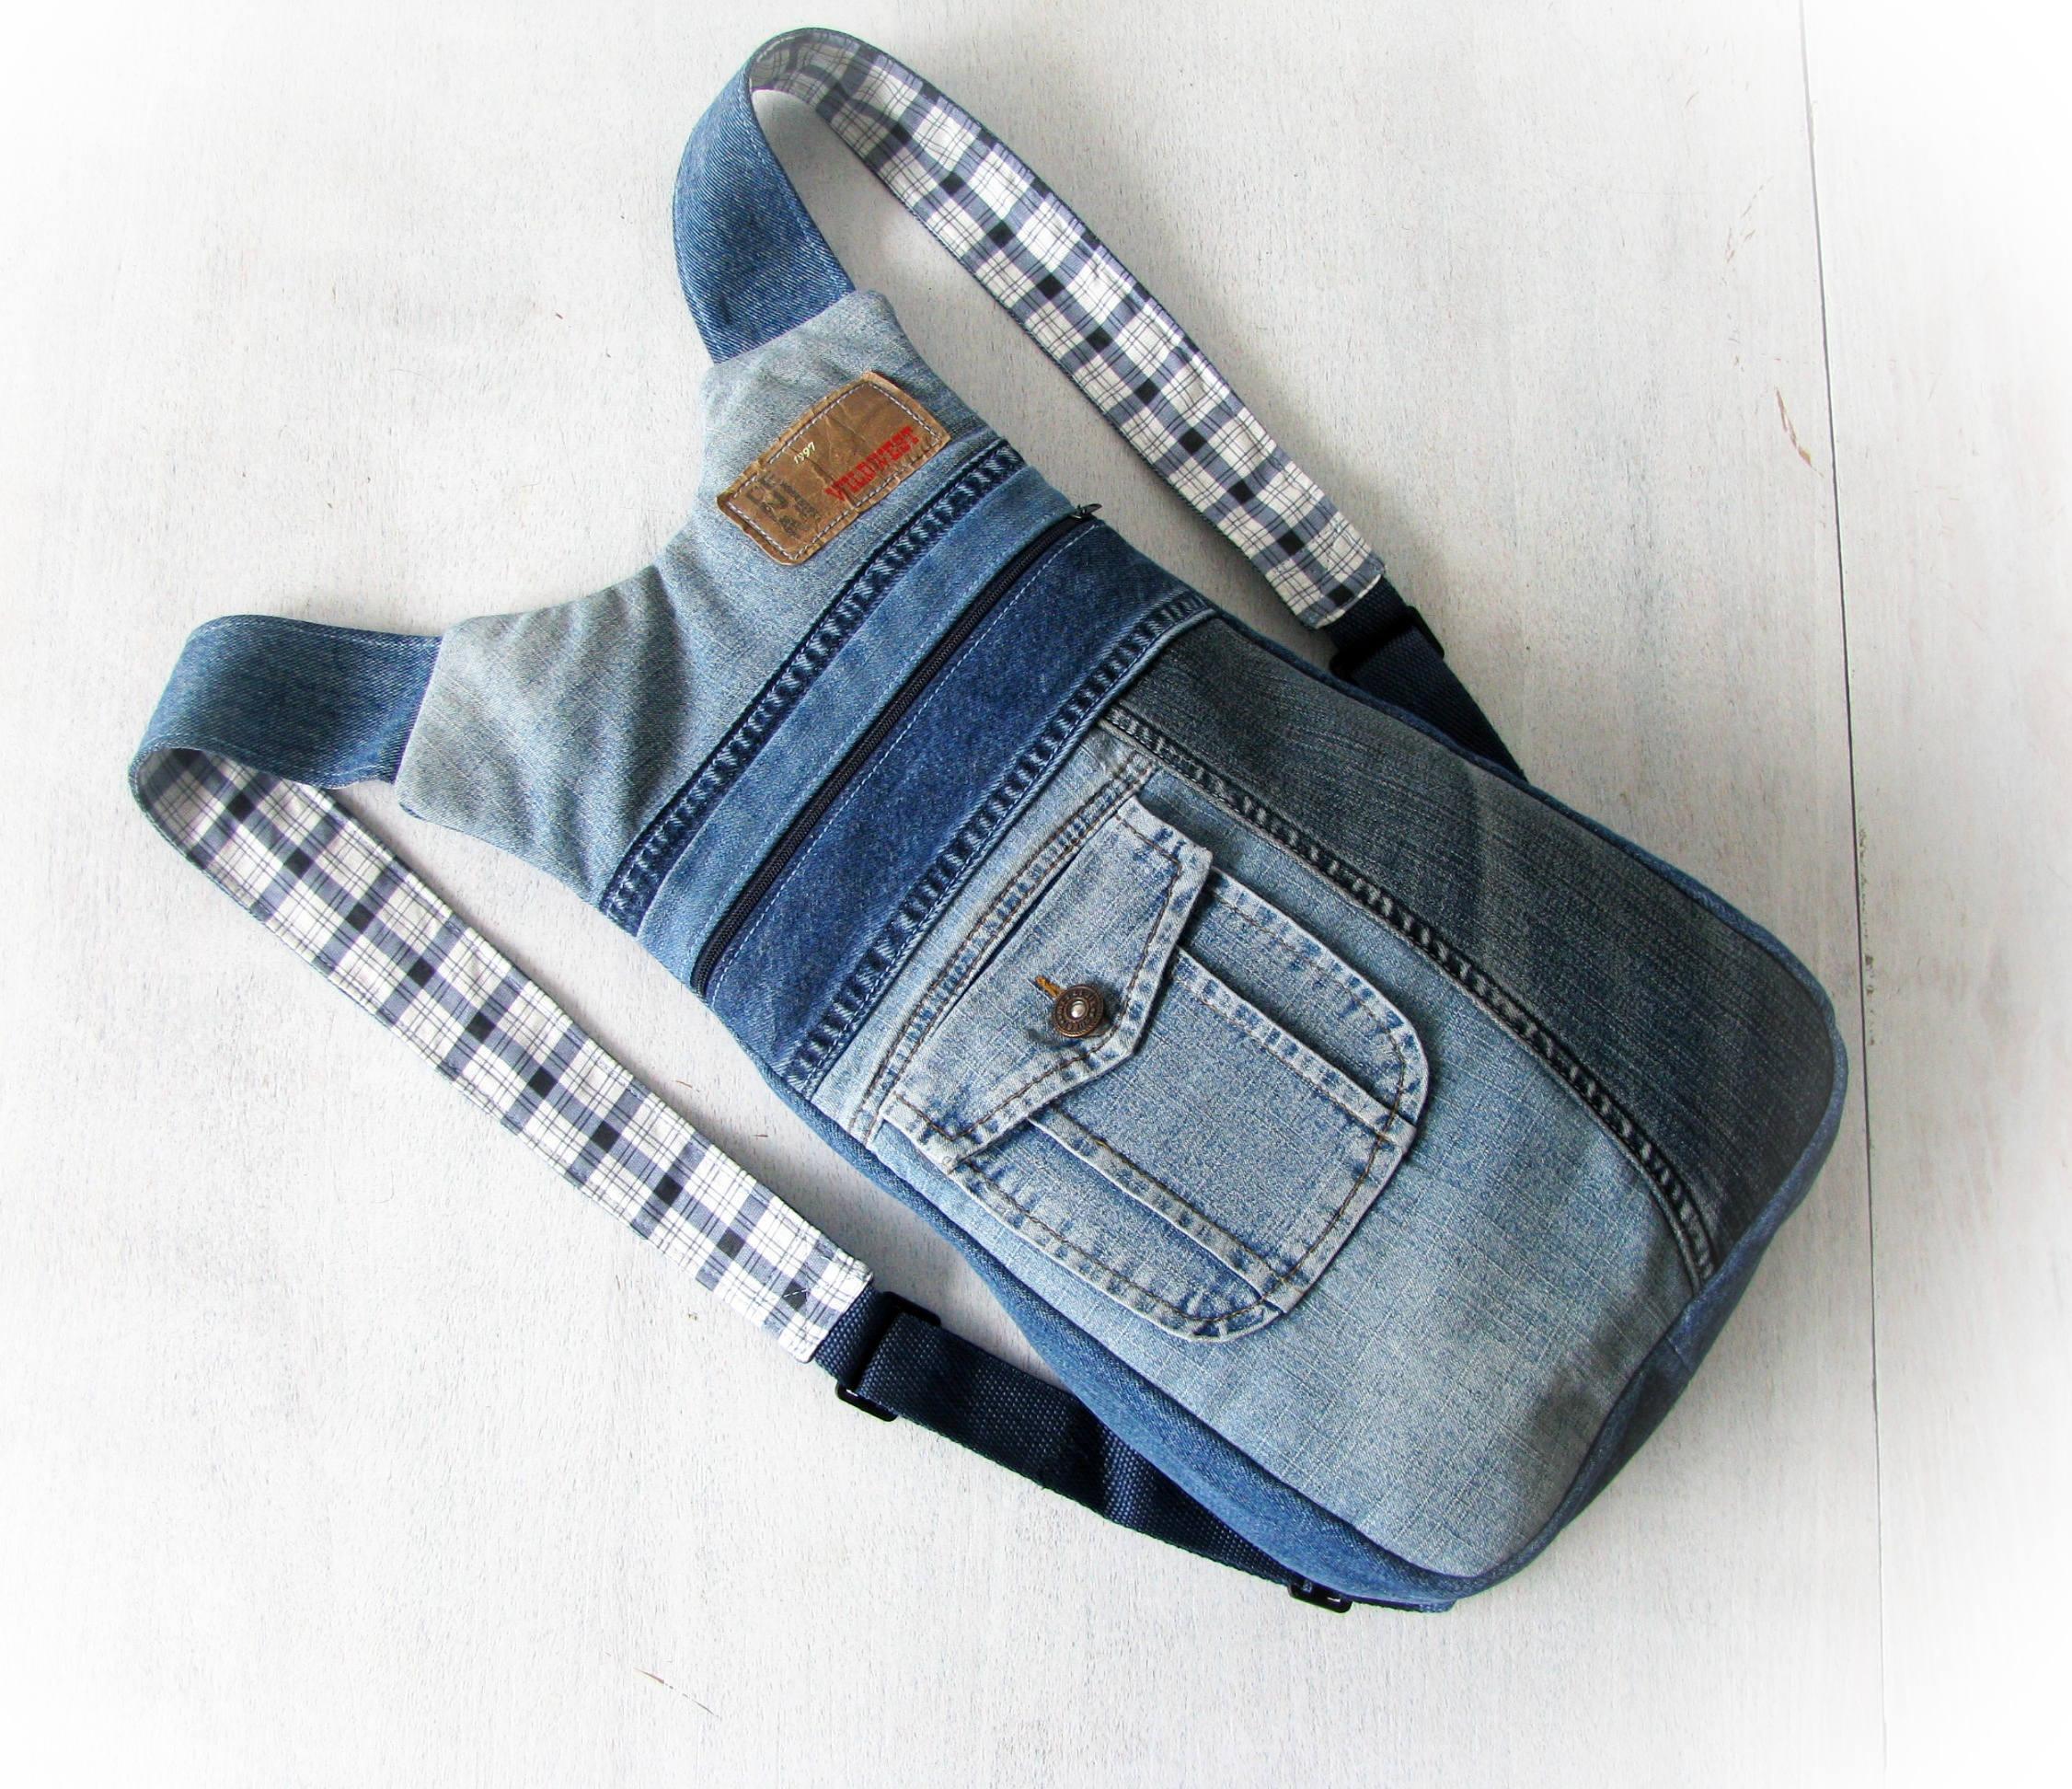 Unisex ipad jeans backpack Back to School ipad bag Denim rucksack Handmade  patchwork backpack Jean backpack 1d47d97d3ea90